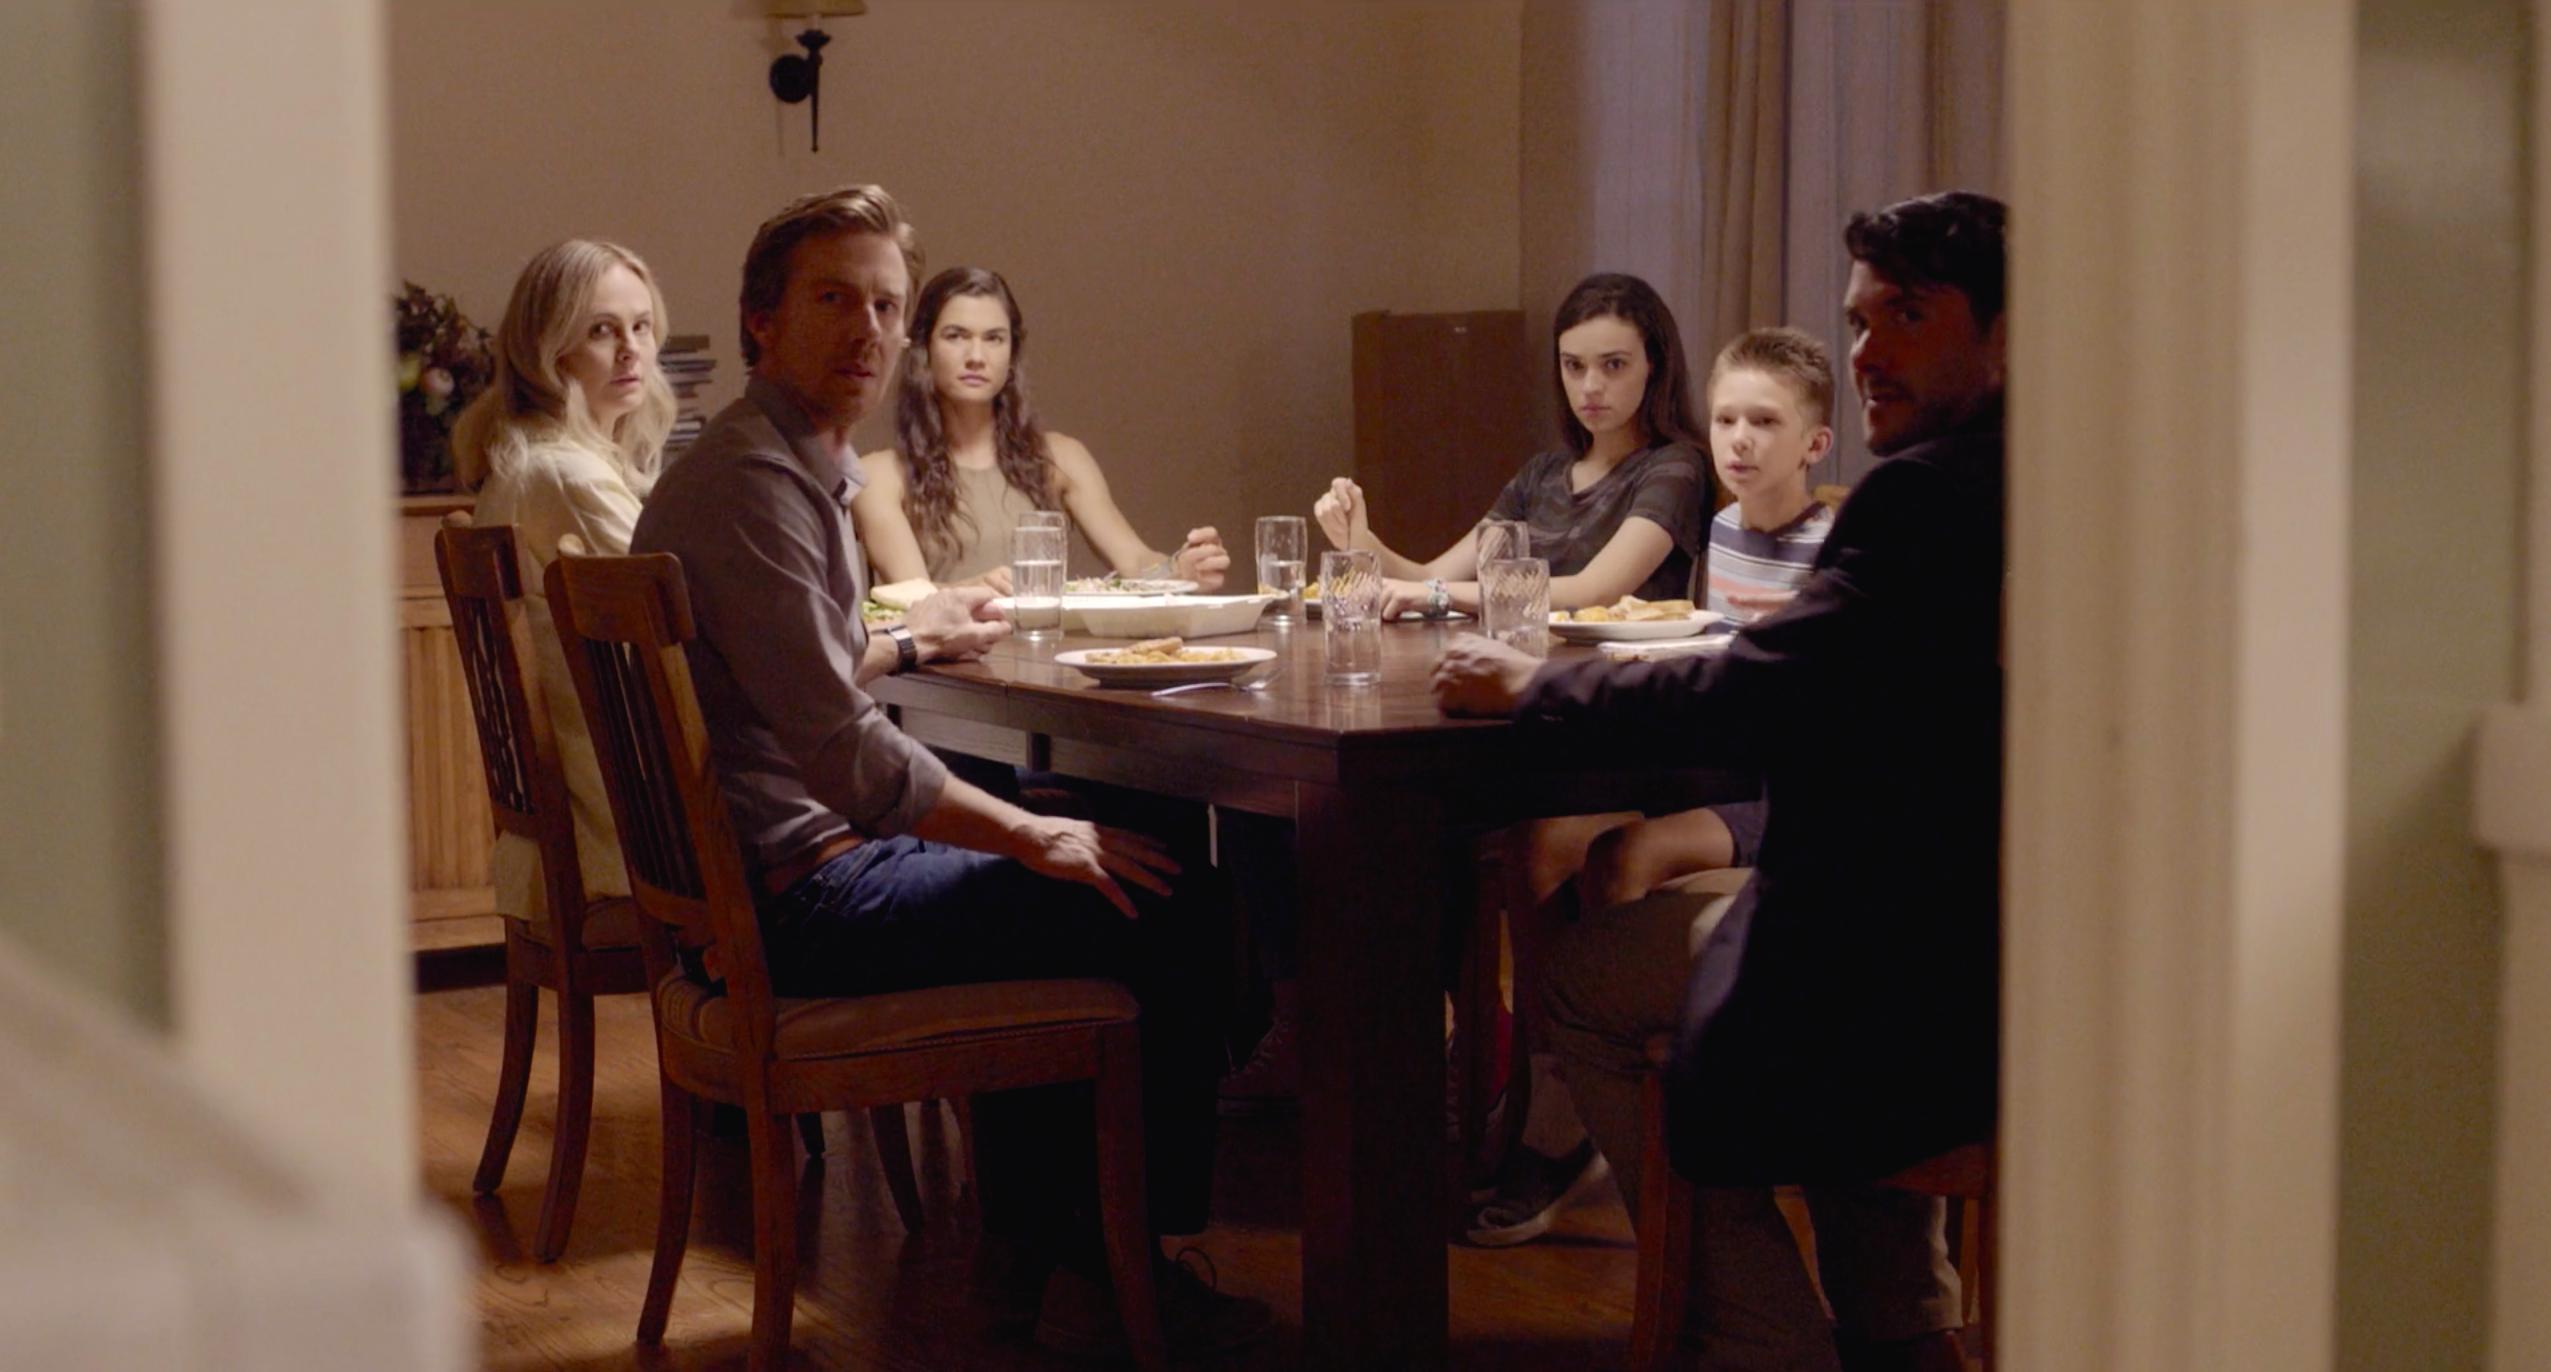 Annie Little, John Antonini, Teri Reeves, Michael Milford, Ava Capri, and Anderson Piller in Little Rituals